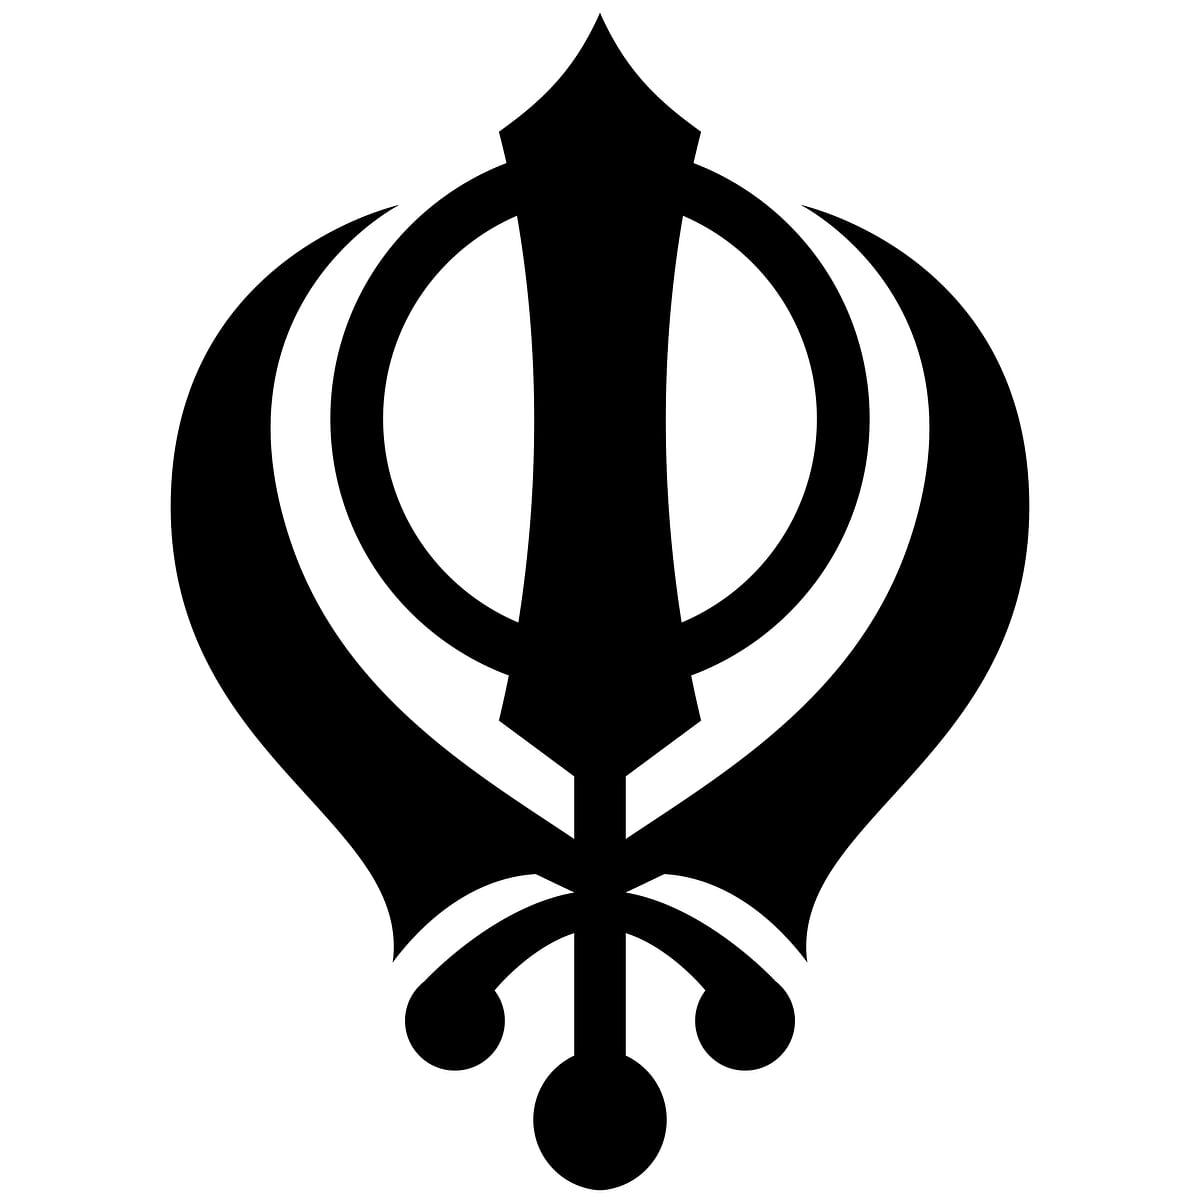 गुरू हर राय जी- Sikh Guru Har Rai in Hindi